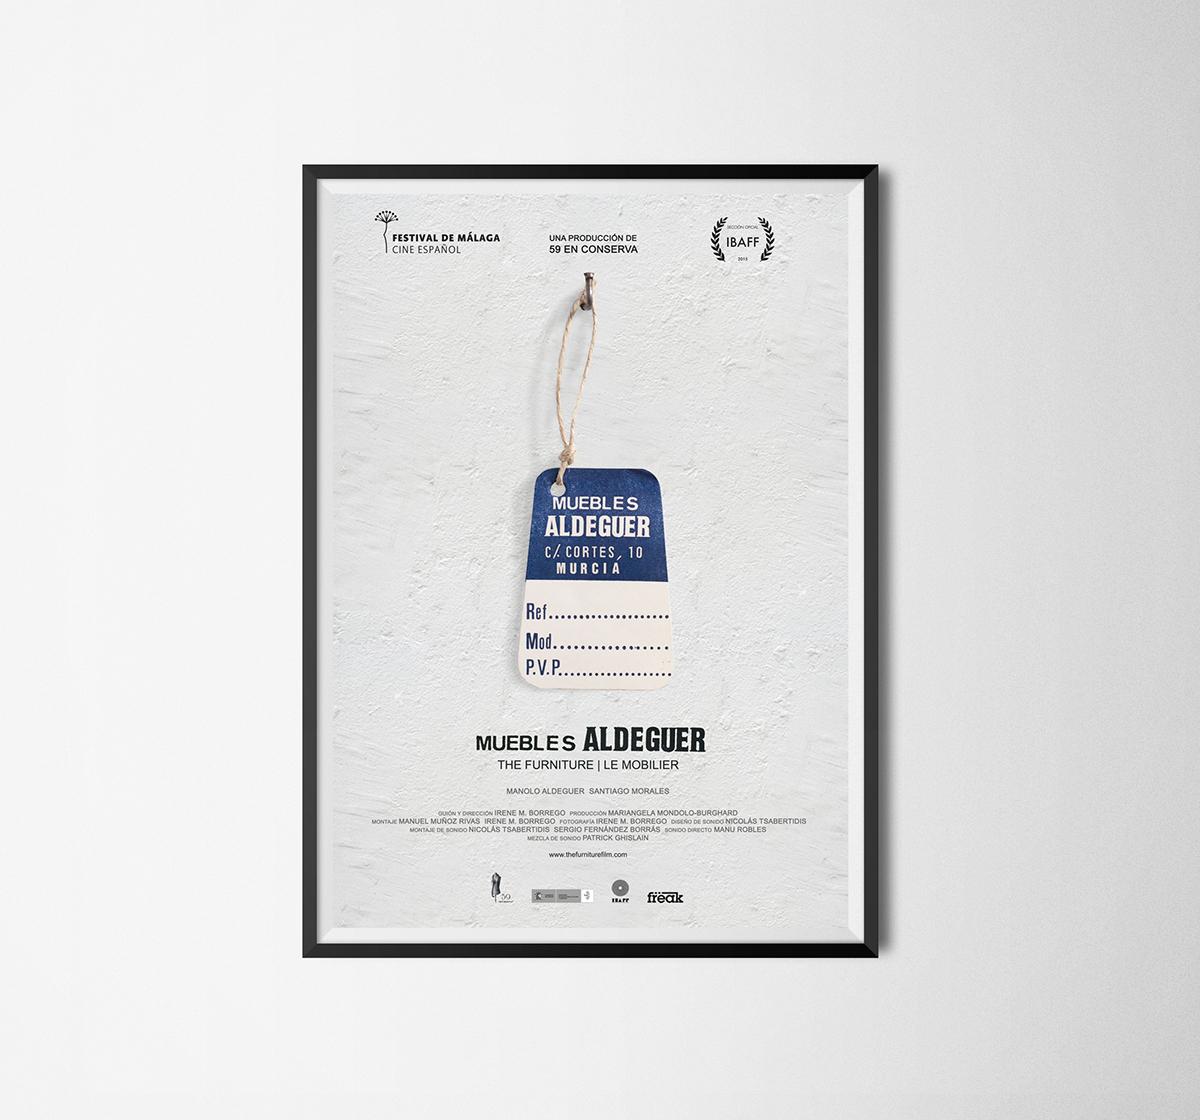 Adobe Portfolio 59enConserva poster cartel festivalmalaga ibaff cineespañol film director